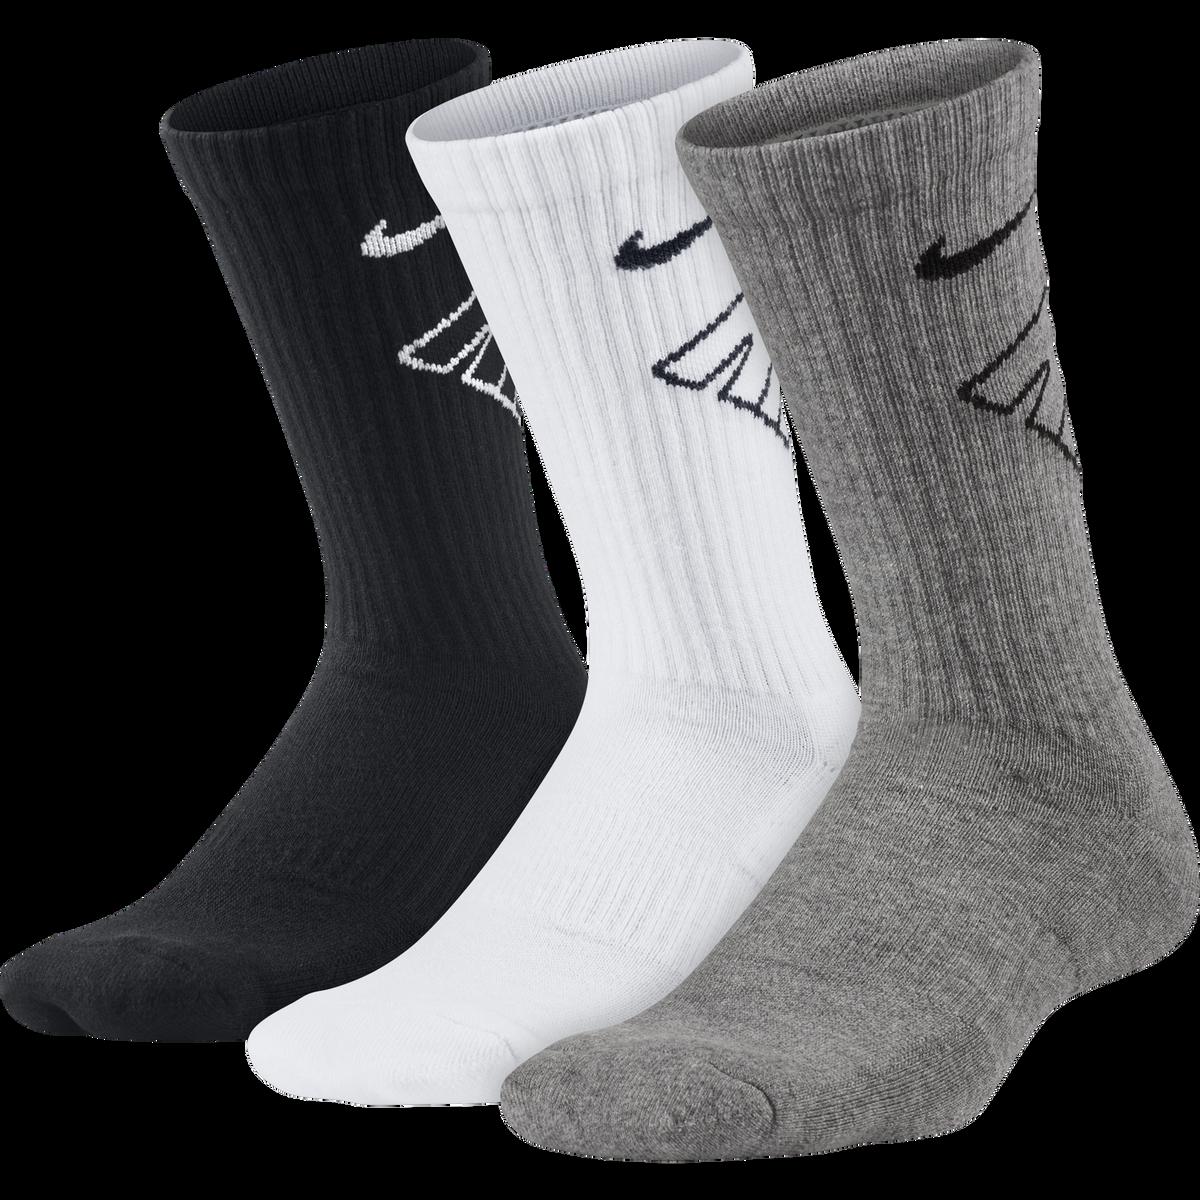 Nike Kids Performance Cushioned Crew Training Socks (3 Pair)